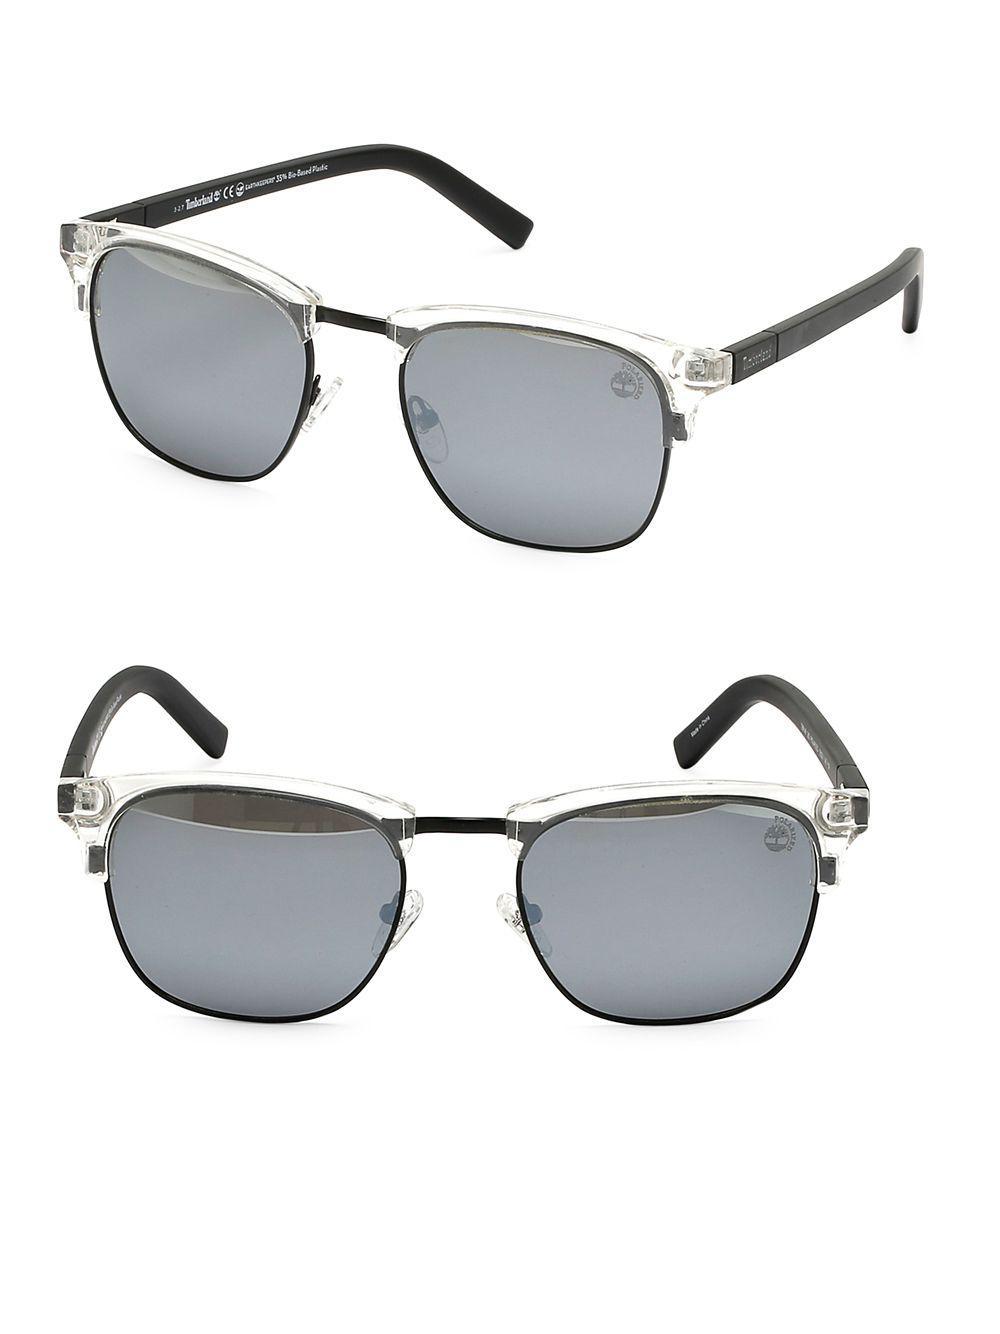 26dfbc70cb6 Timberland Polarized 55mm Soft Square Sunglasses in Black for Men - Lyst